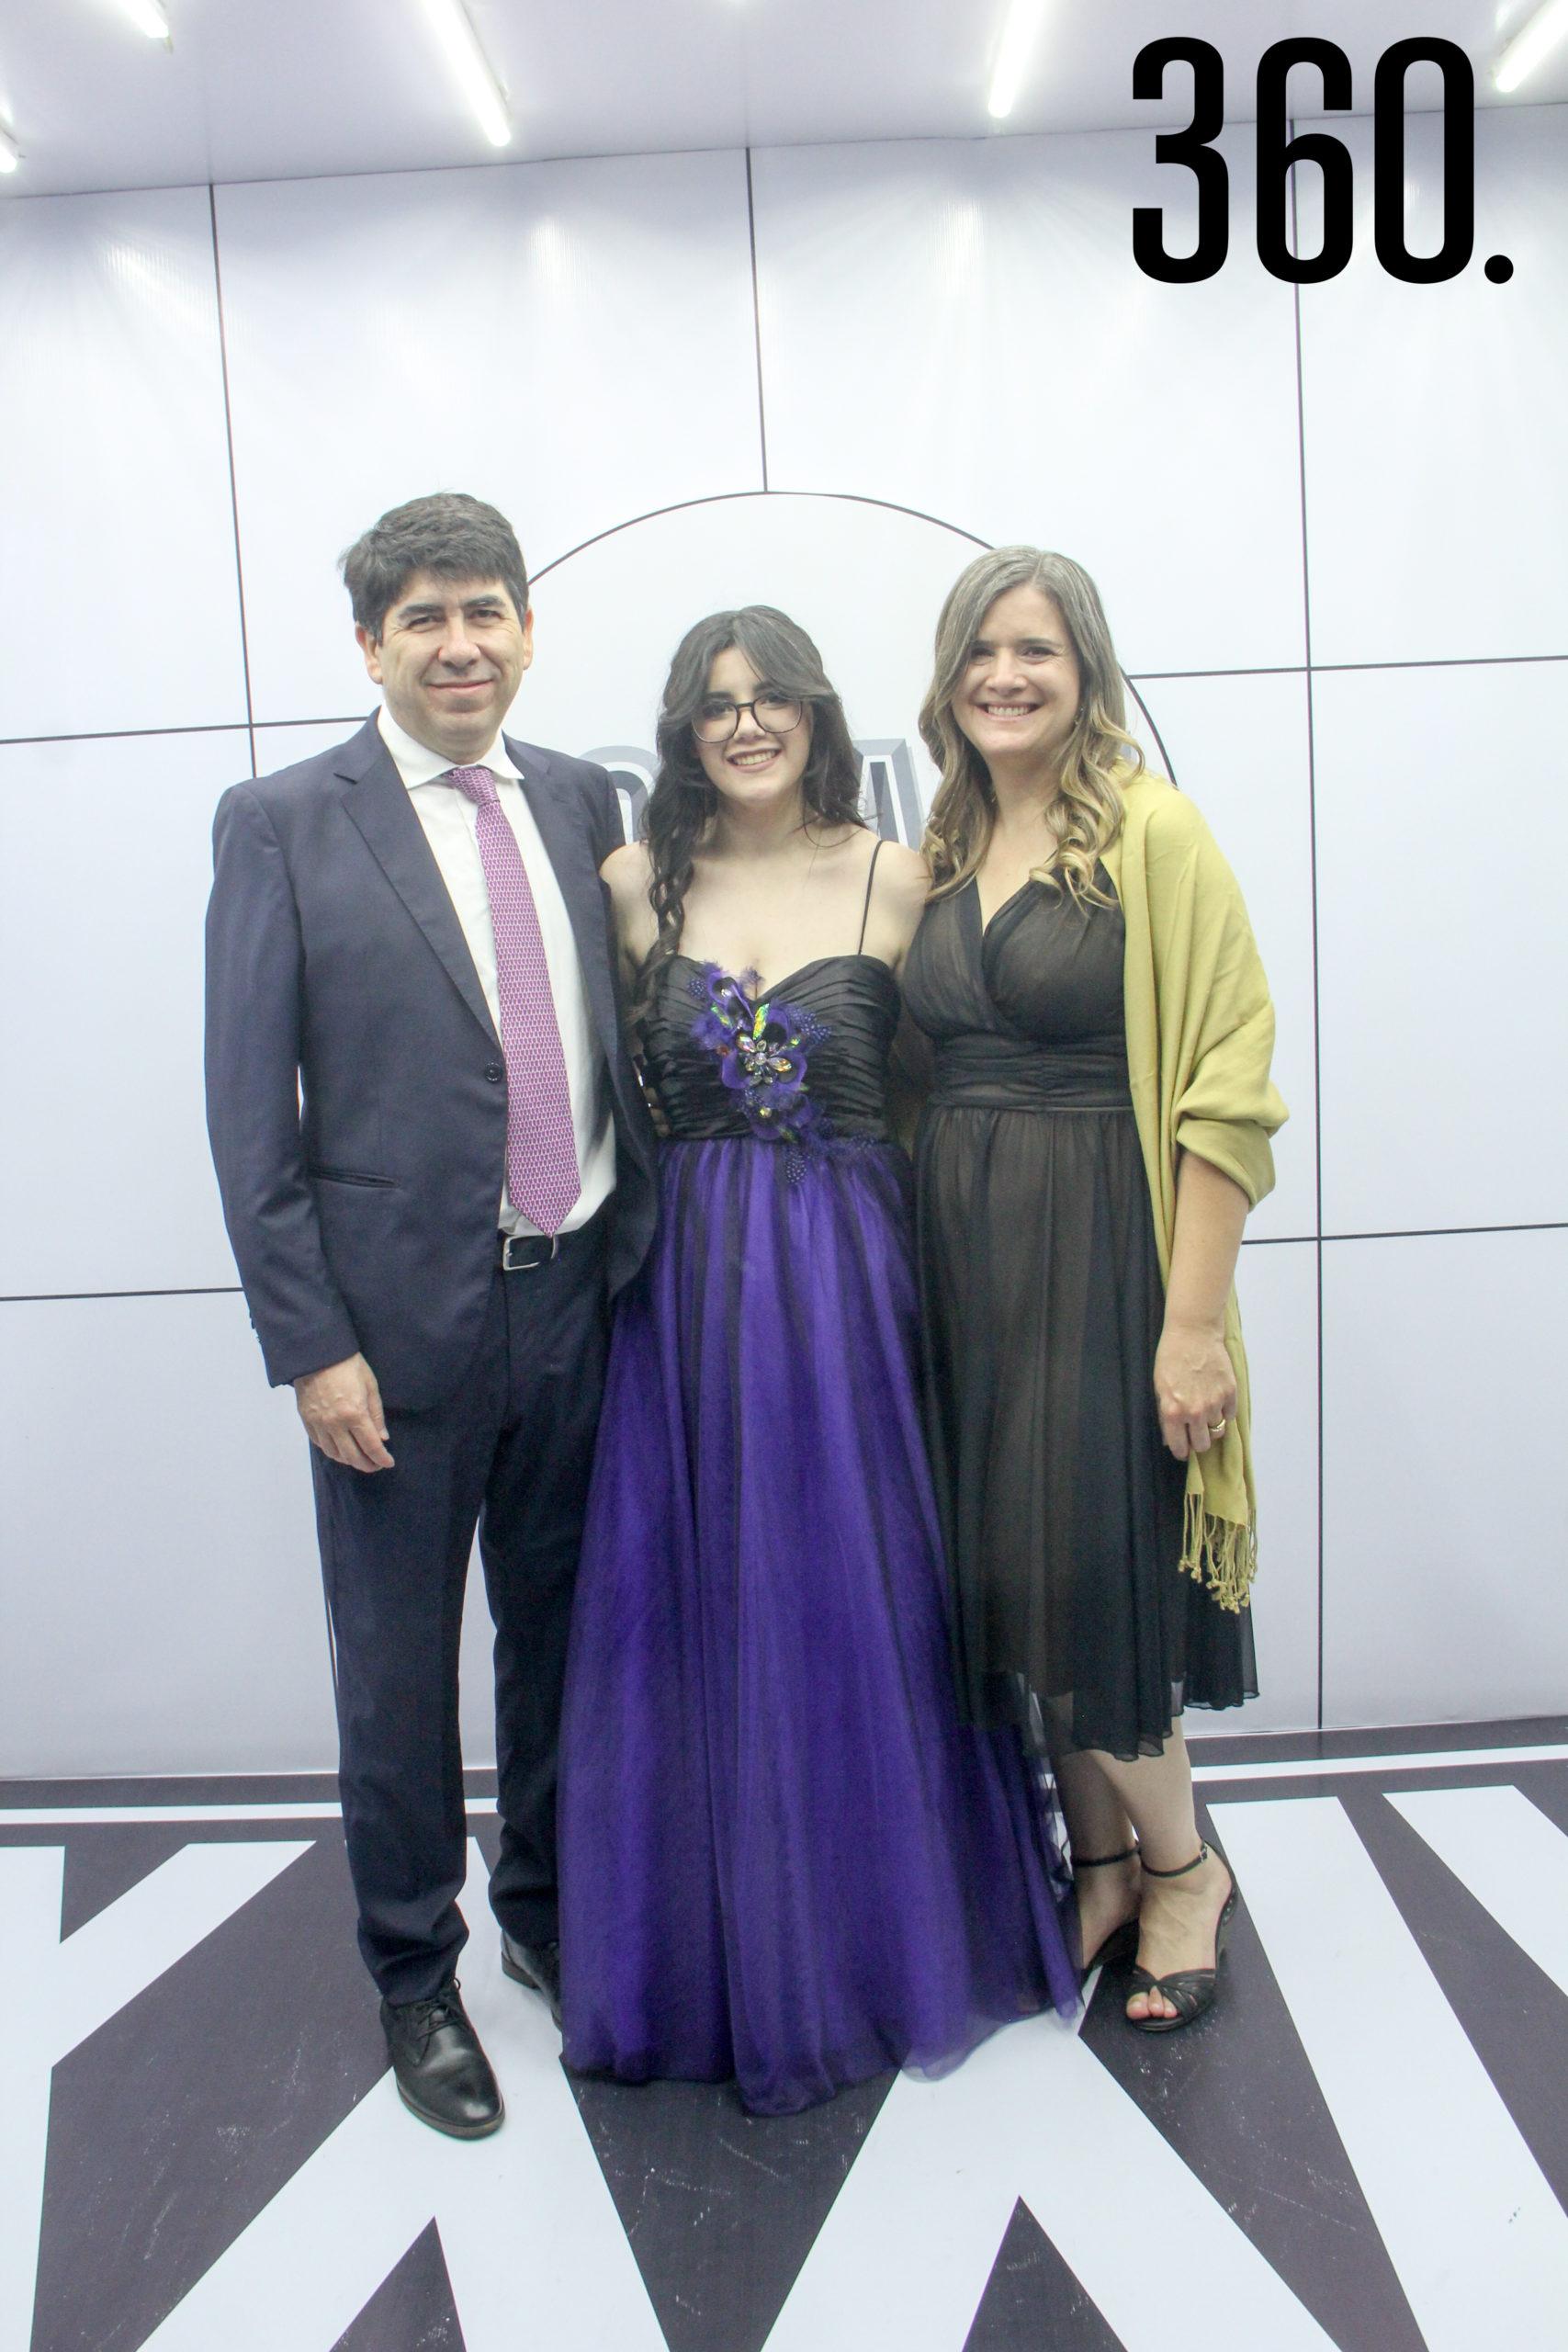 Alejandro Osuna, Alicia Osuna y Romelia Reja.